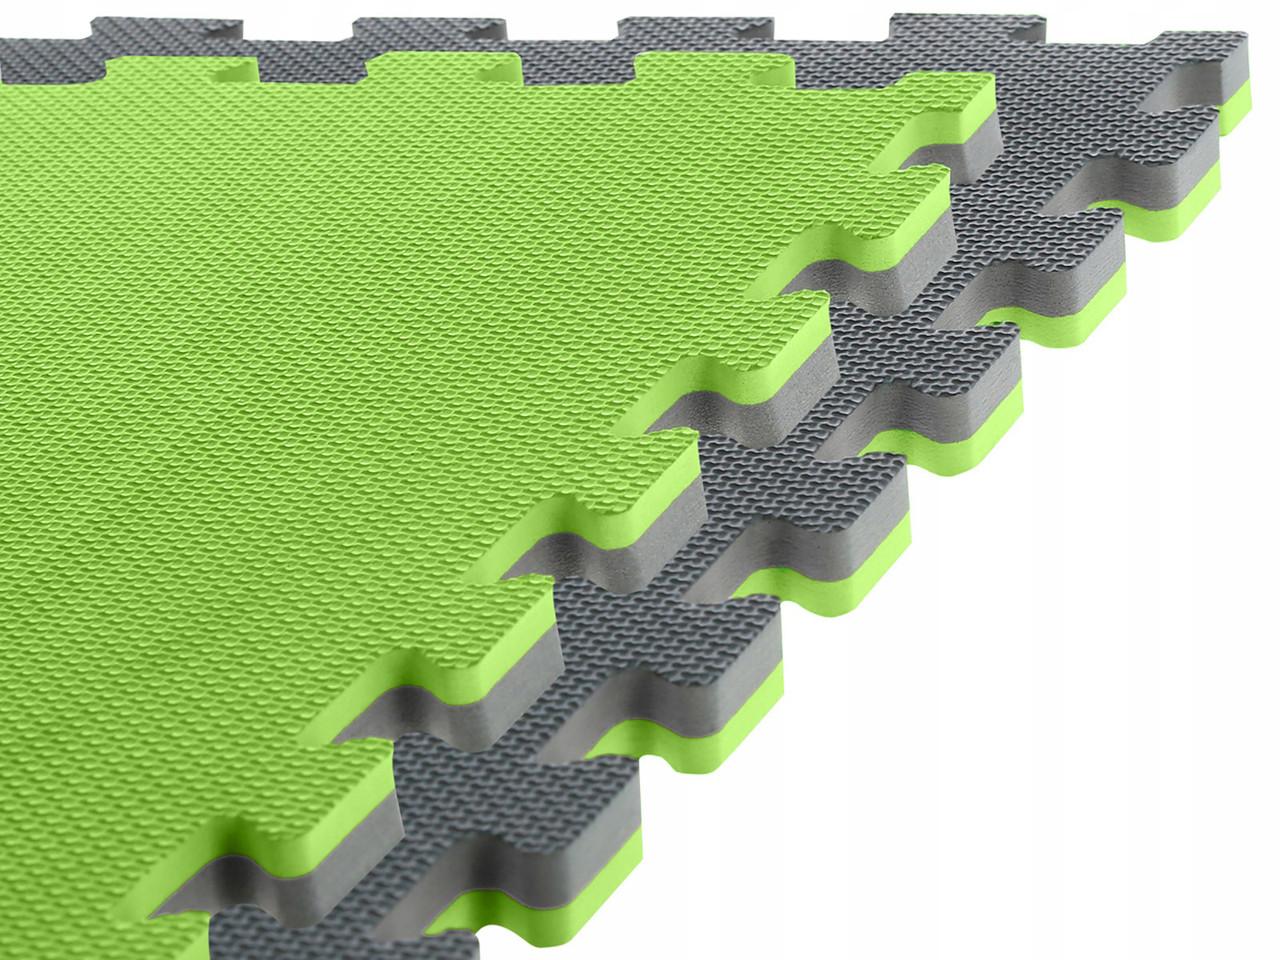 Спортивный мат-татами (ласточкин хвост, пазл) SportVida Mat Puzzle Multicolor 100 x 100 x 2 cм SV-HK0182 Grey/Green